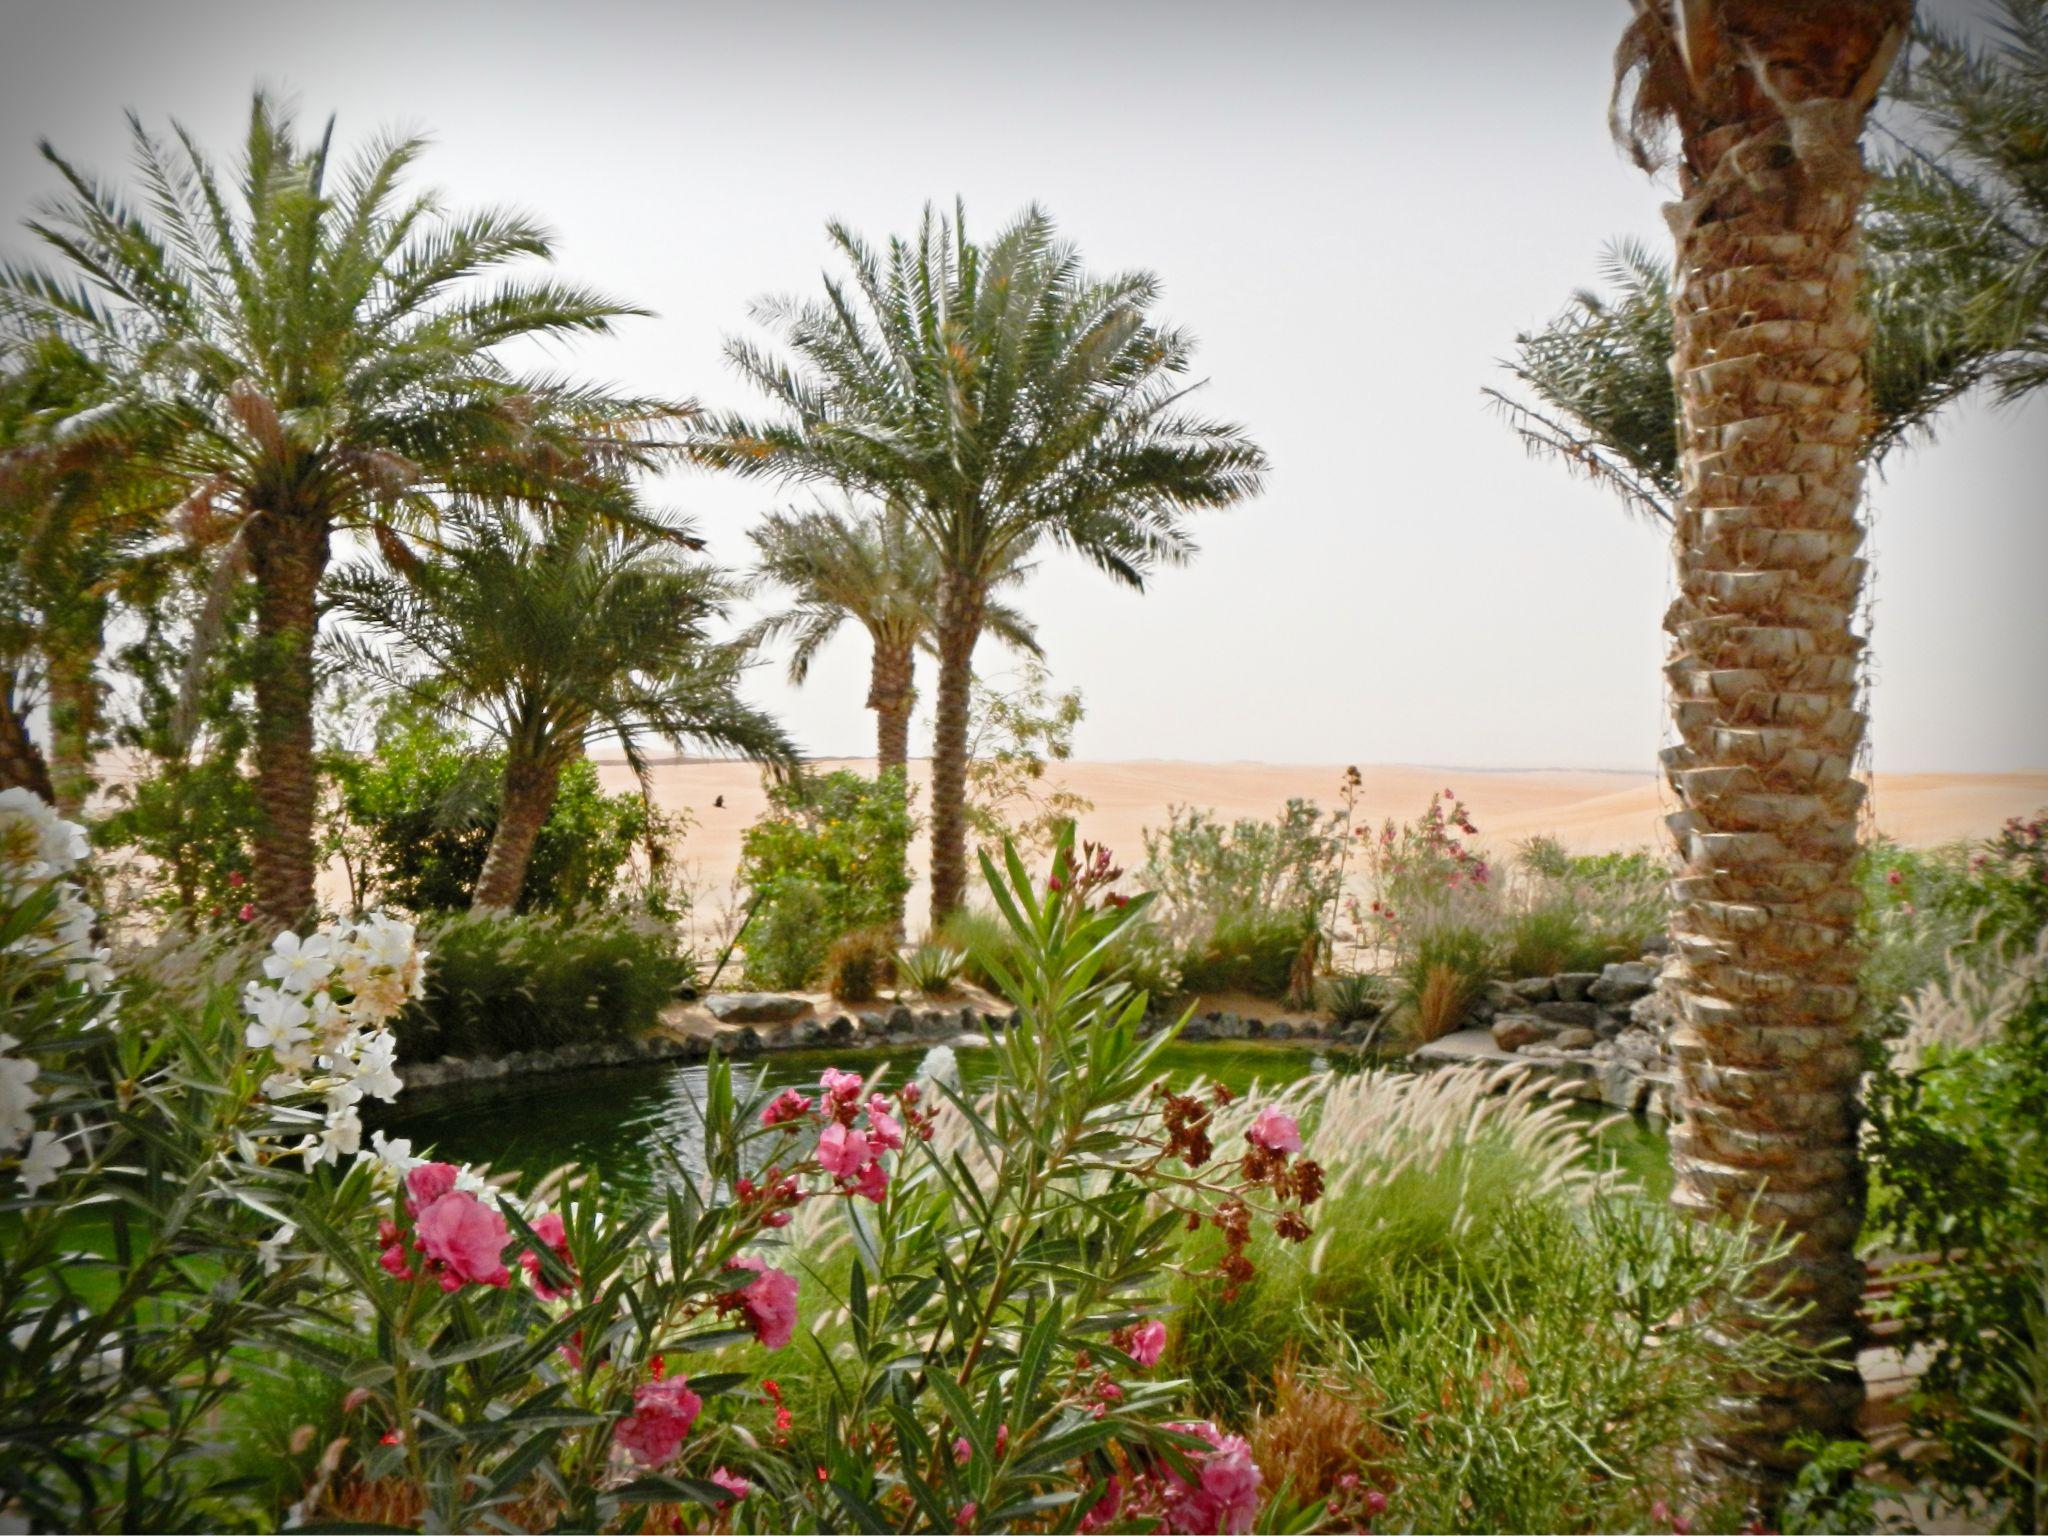 Oasis in the desert, United Arab Emirates